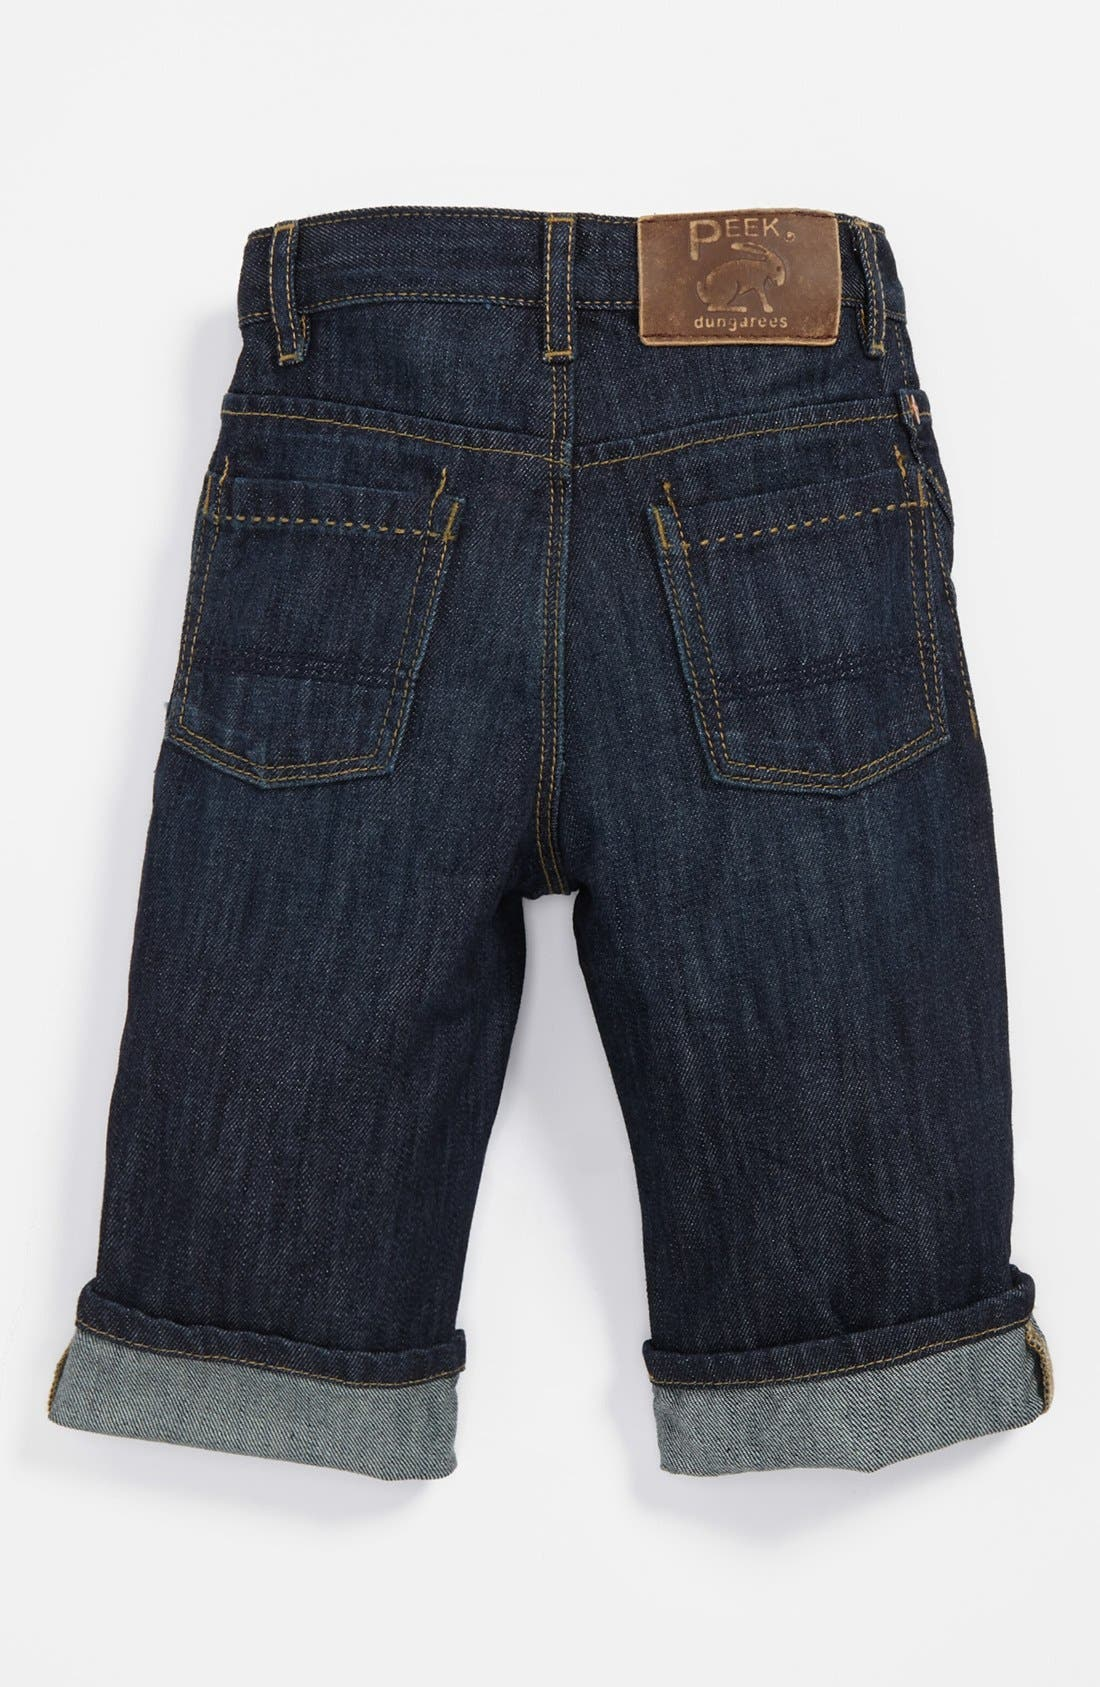 Alternate Image 1 Selected - Peek 'Peanut' Jeans (Baby Boys)